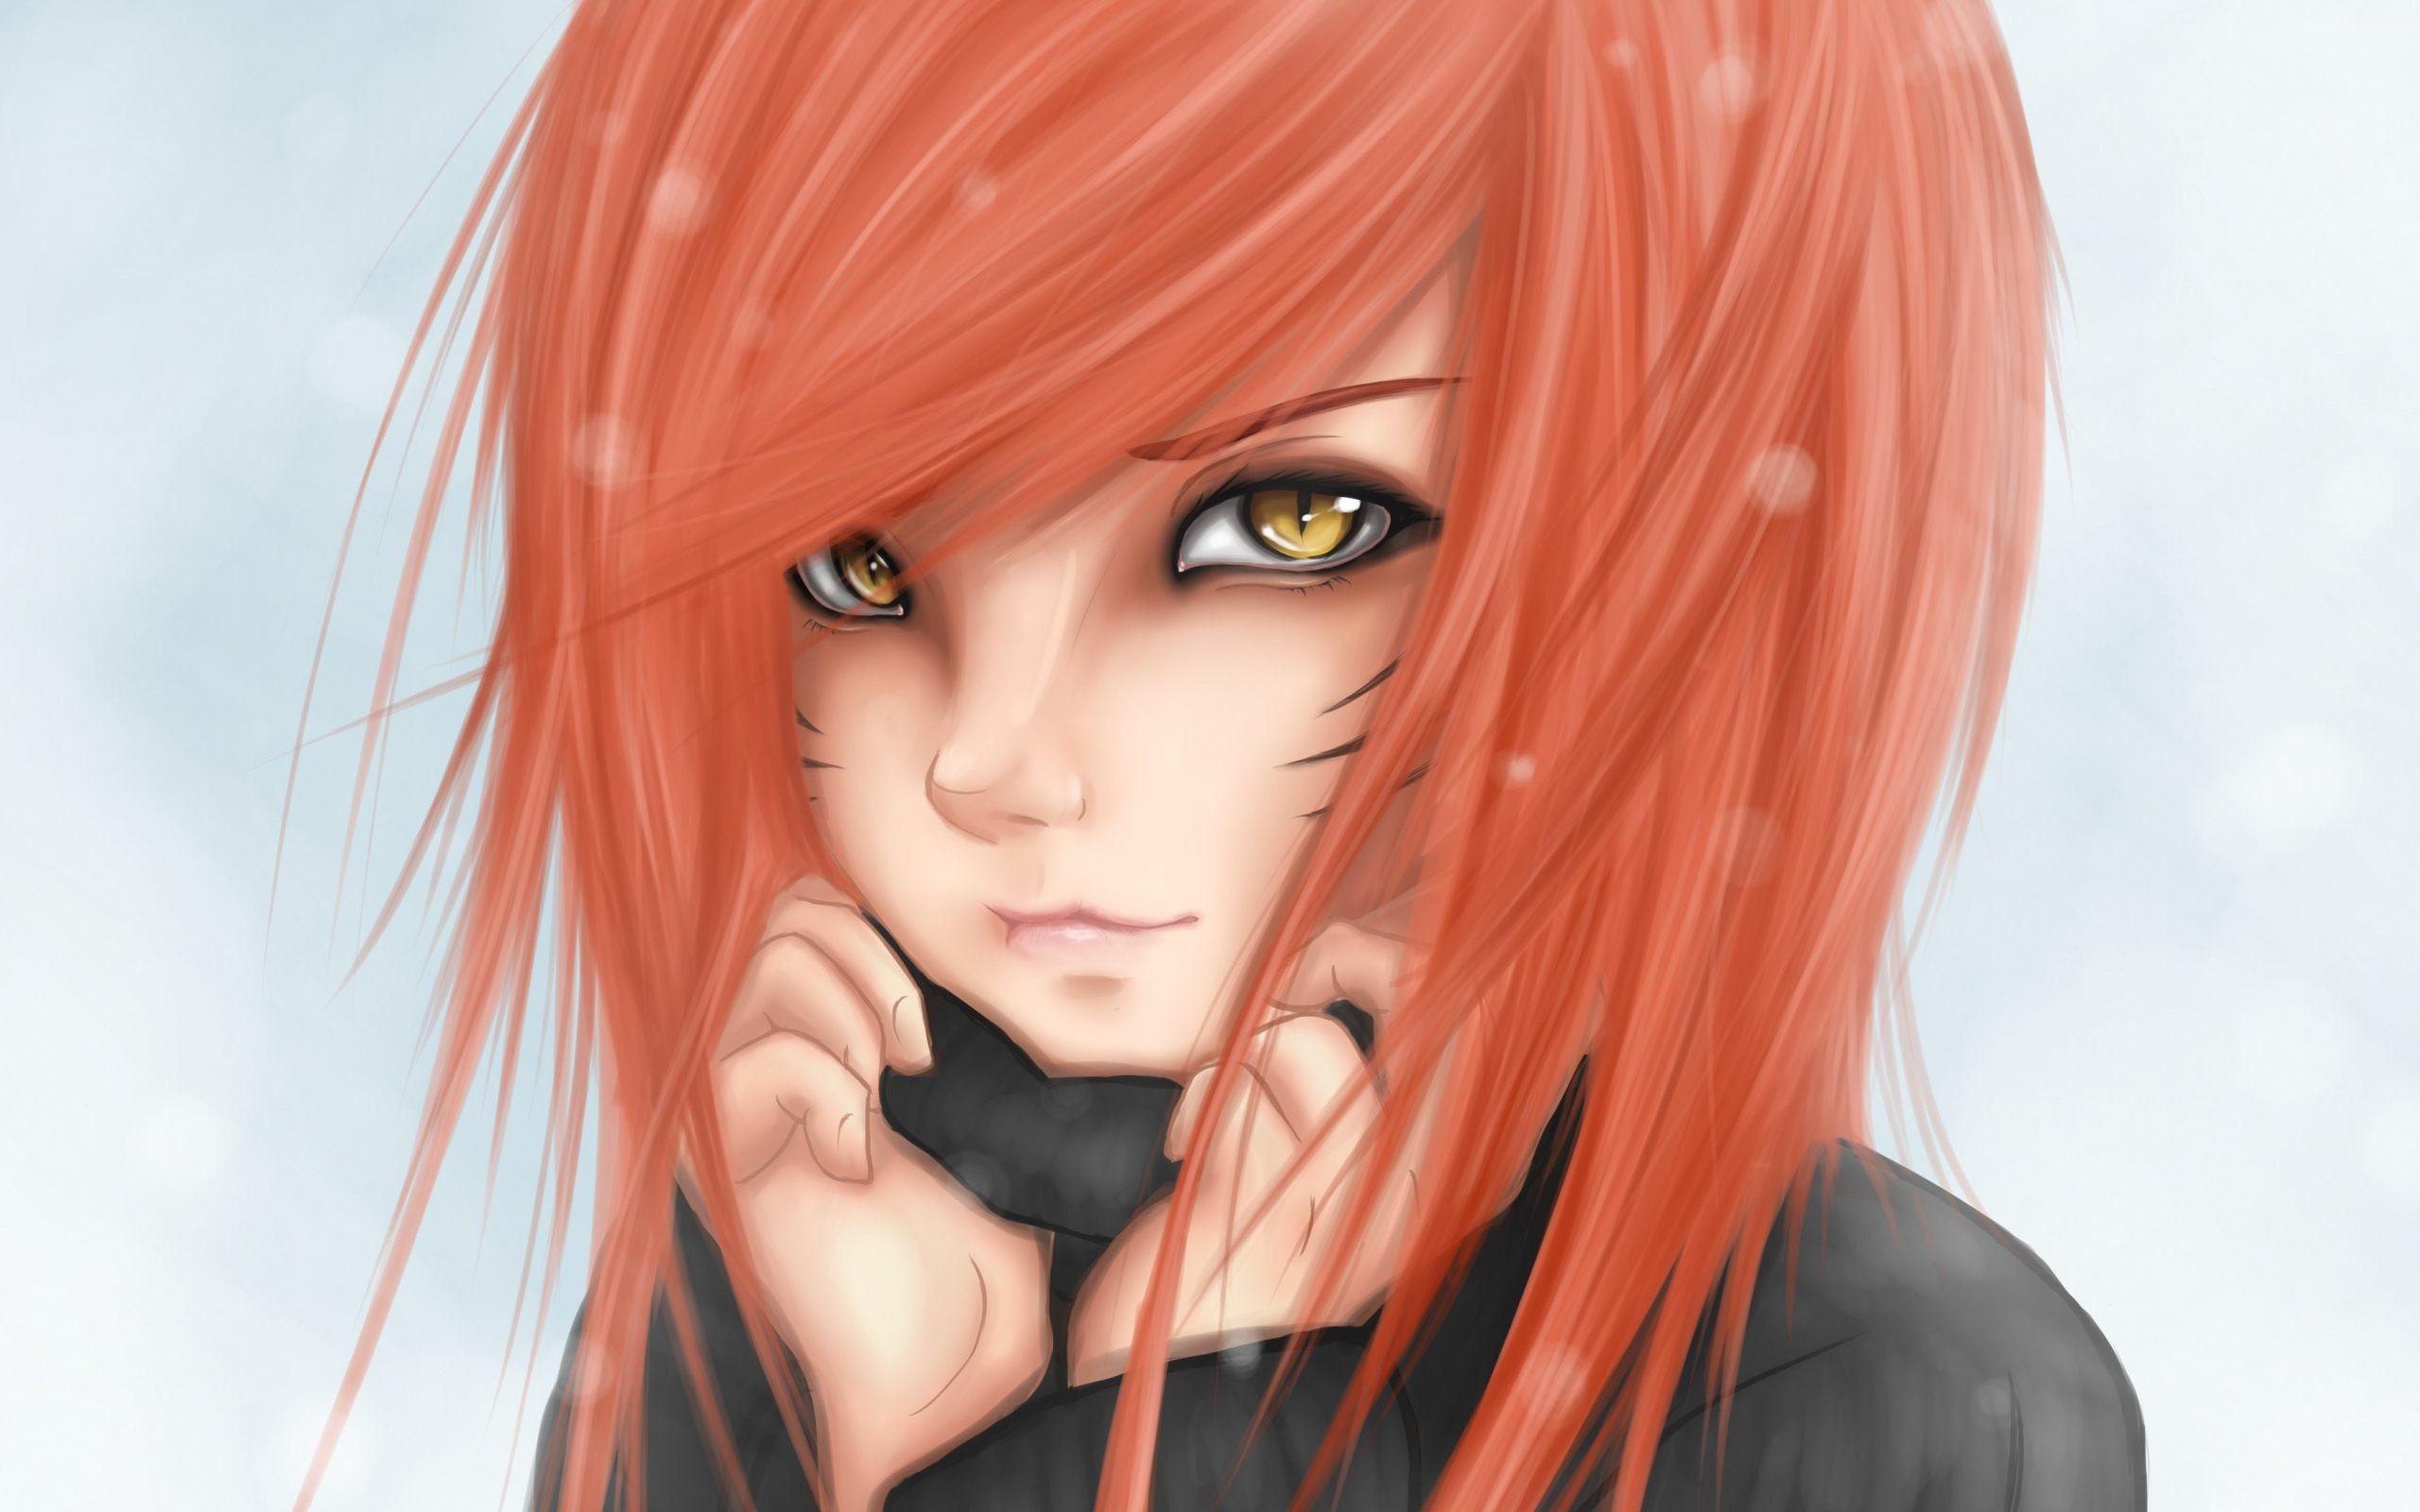 Catseye Anime Girl Wallpaper